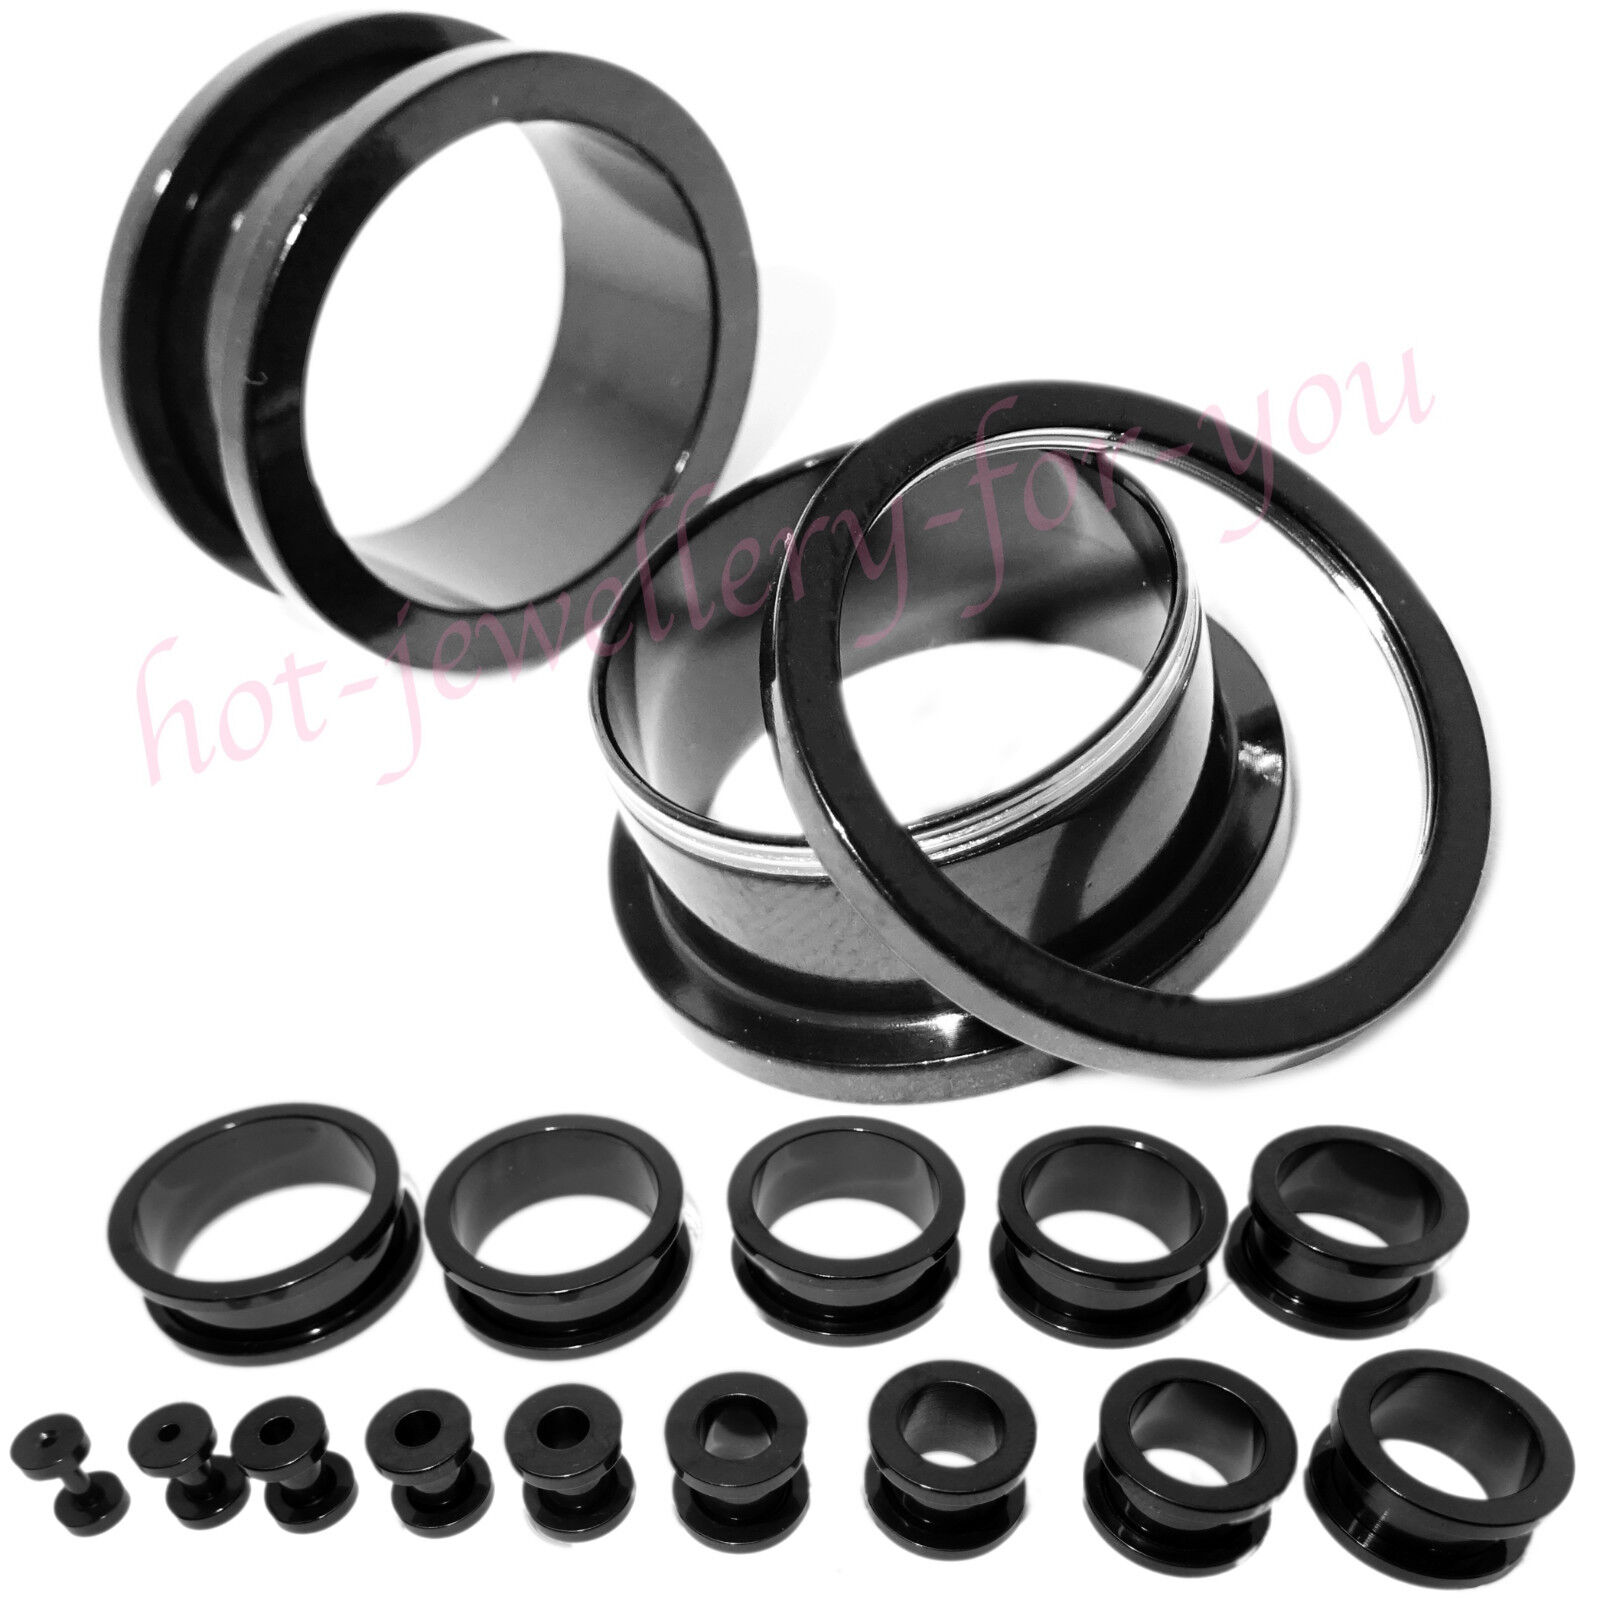 2 x BLACK SCREW BACK Flesh Tunnel Ear Plug Stretcher Steel Titanium Defender